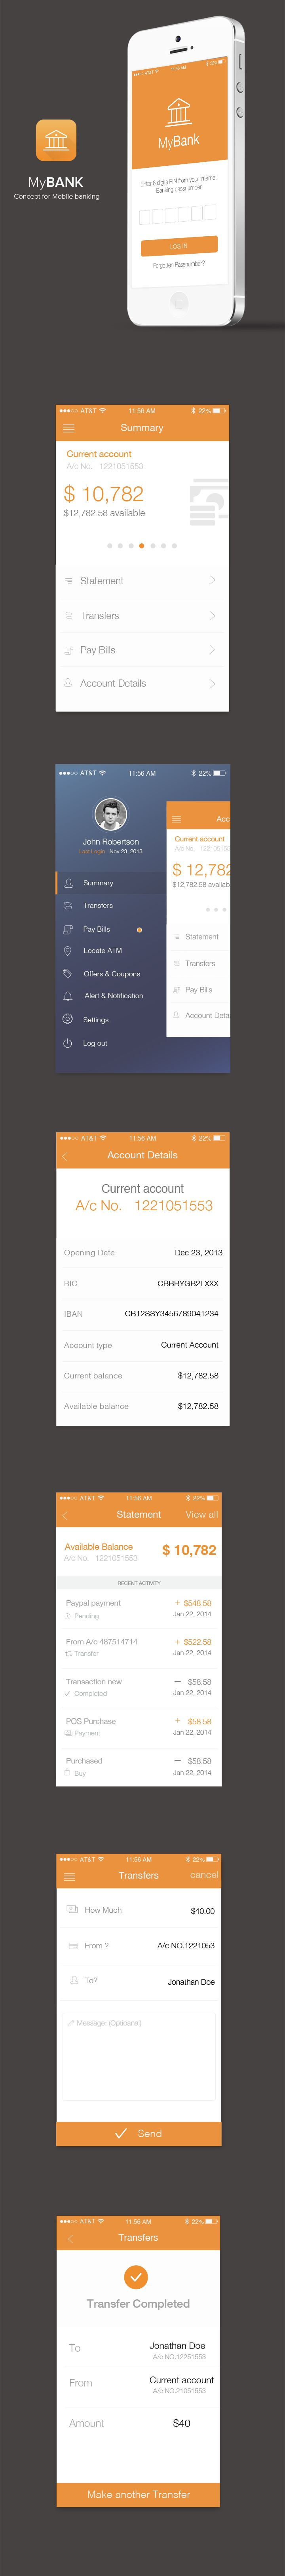 Bank App by sumit chakraborty